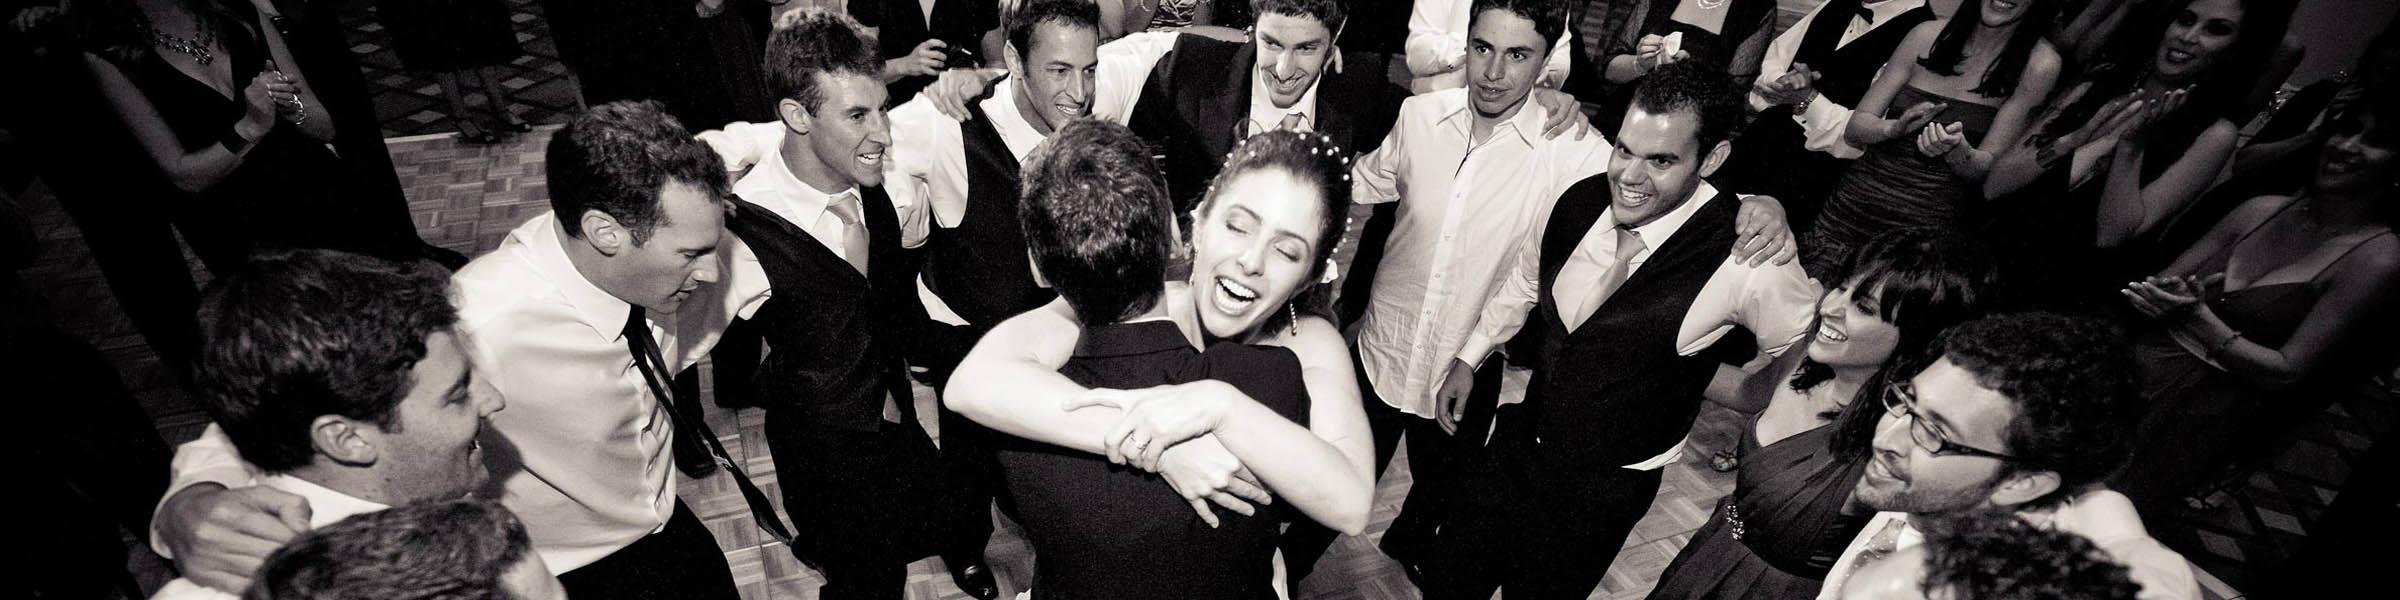 Wedding DJ Gold Coast